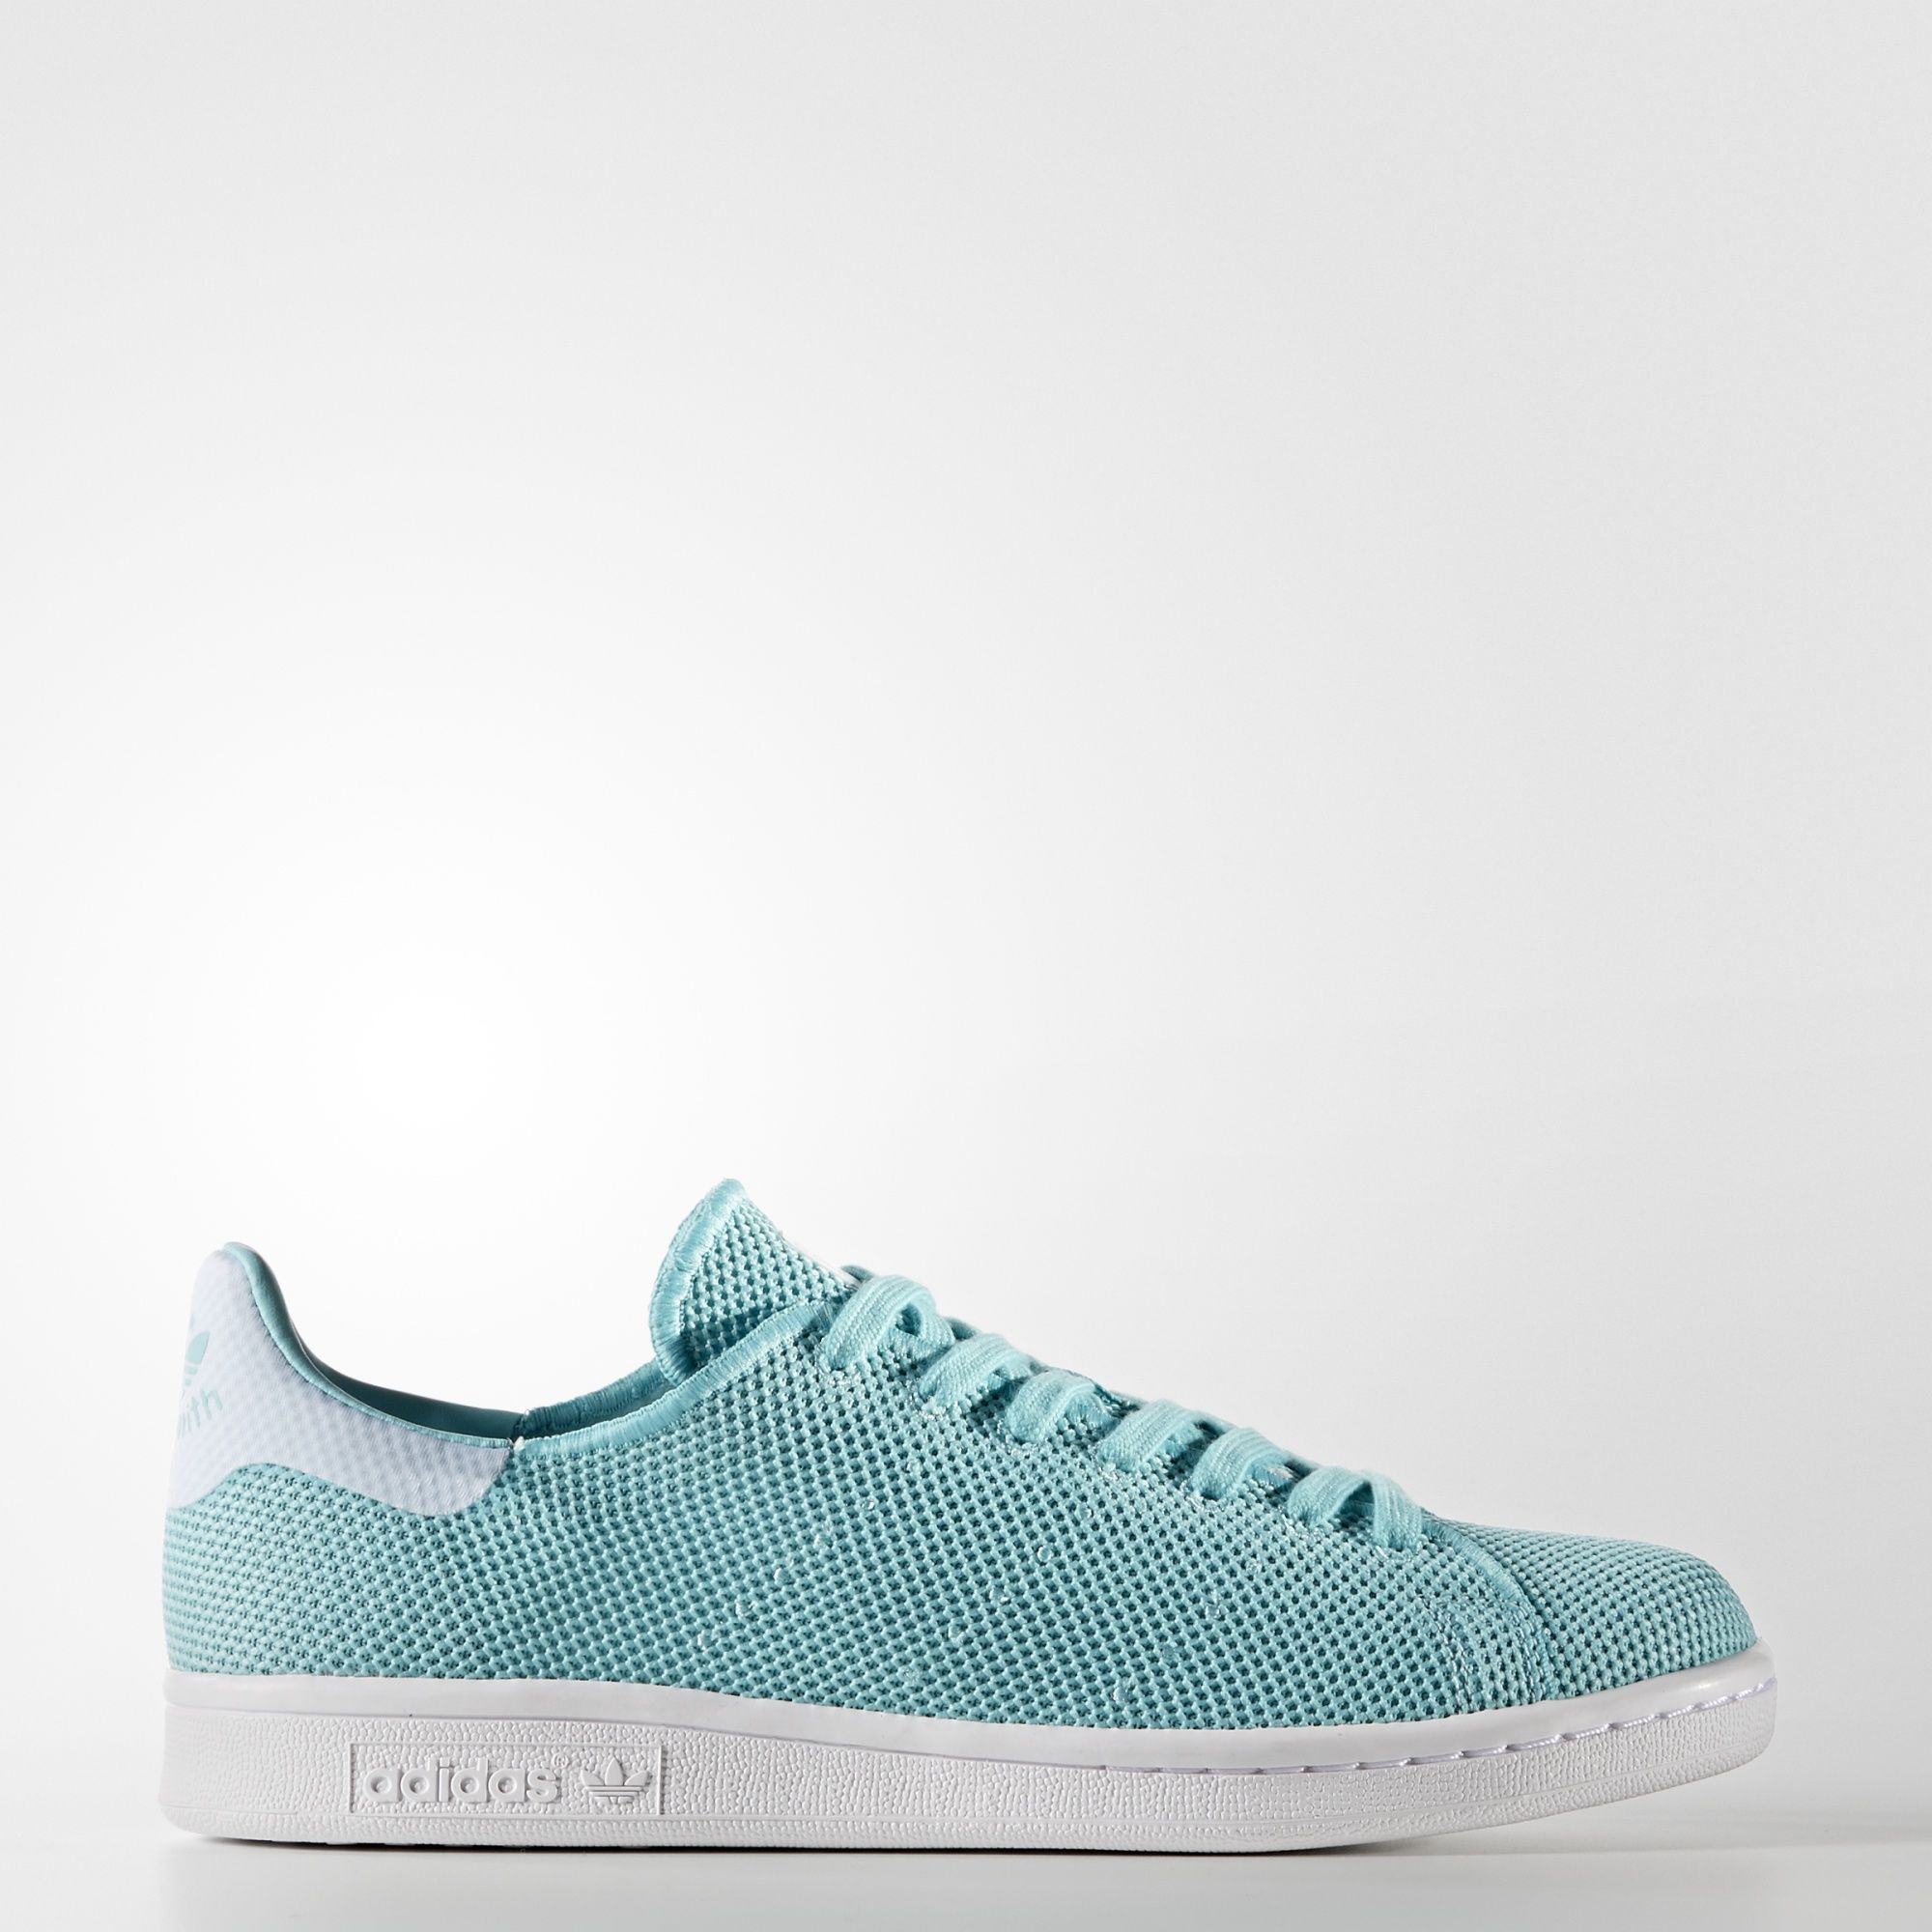 in scarpe da ginnastica adidas stan smith trikalain verde pastello